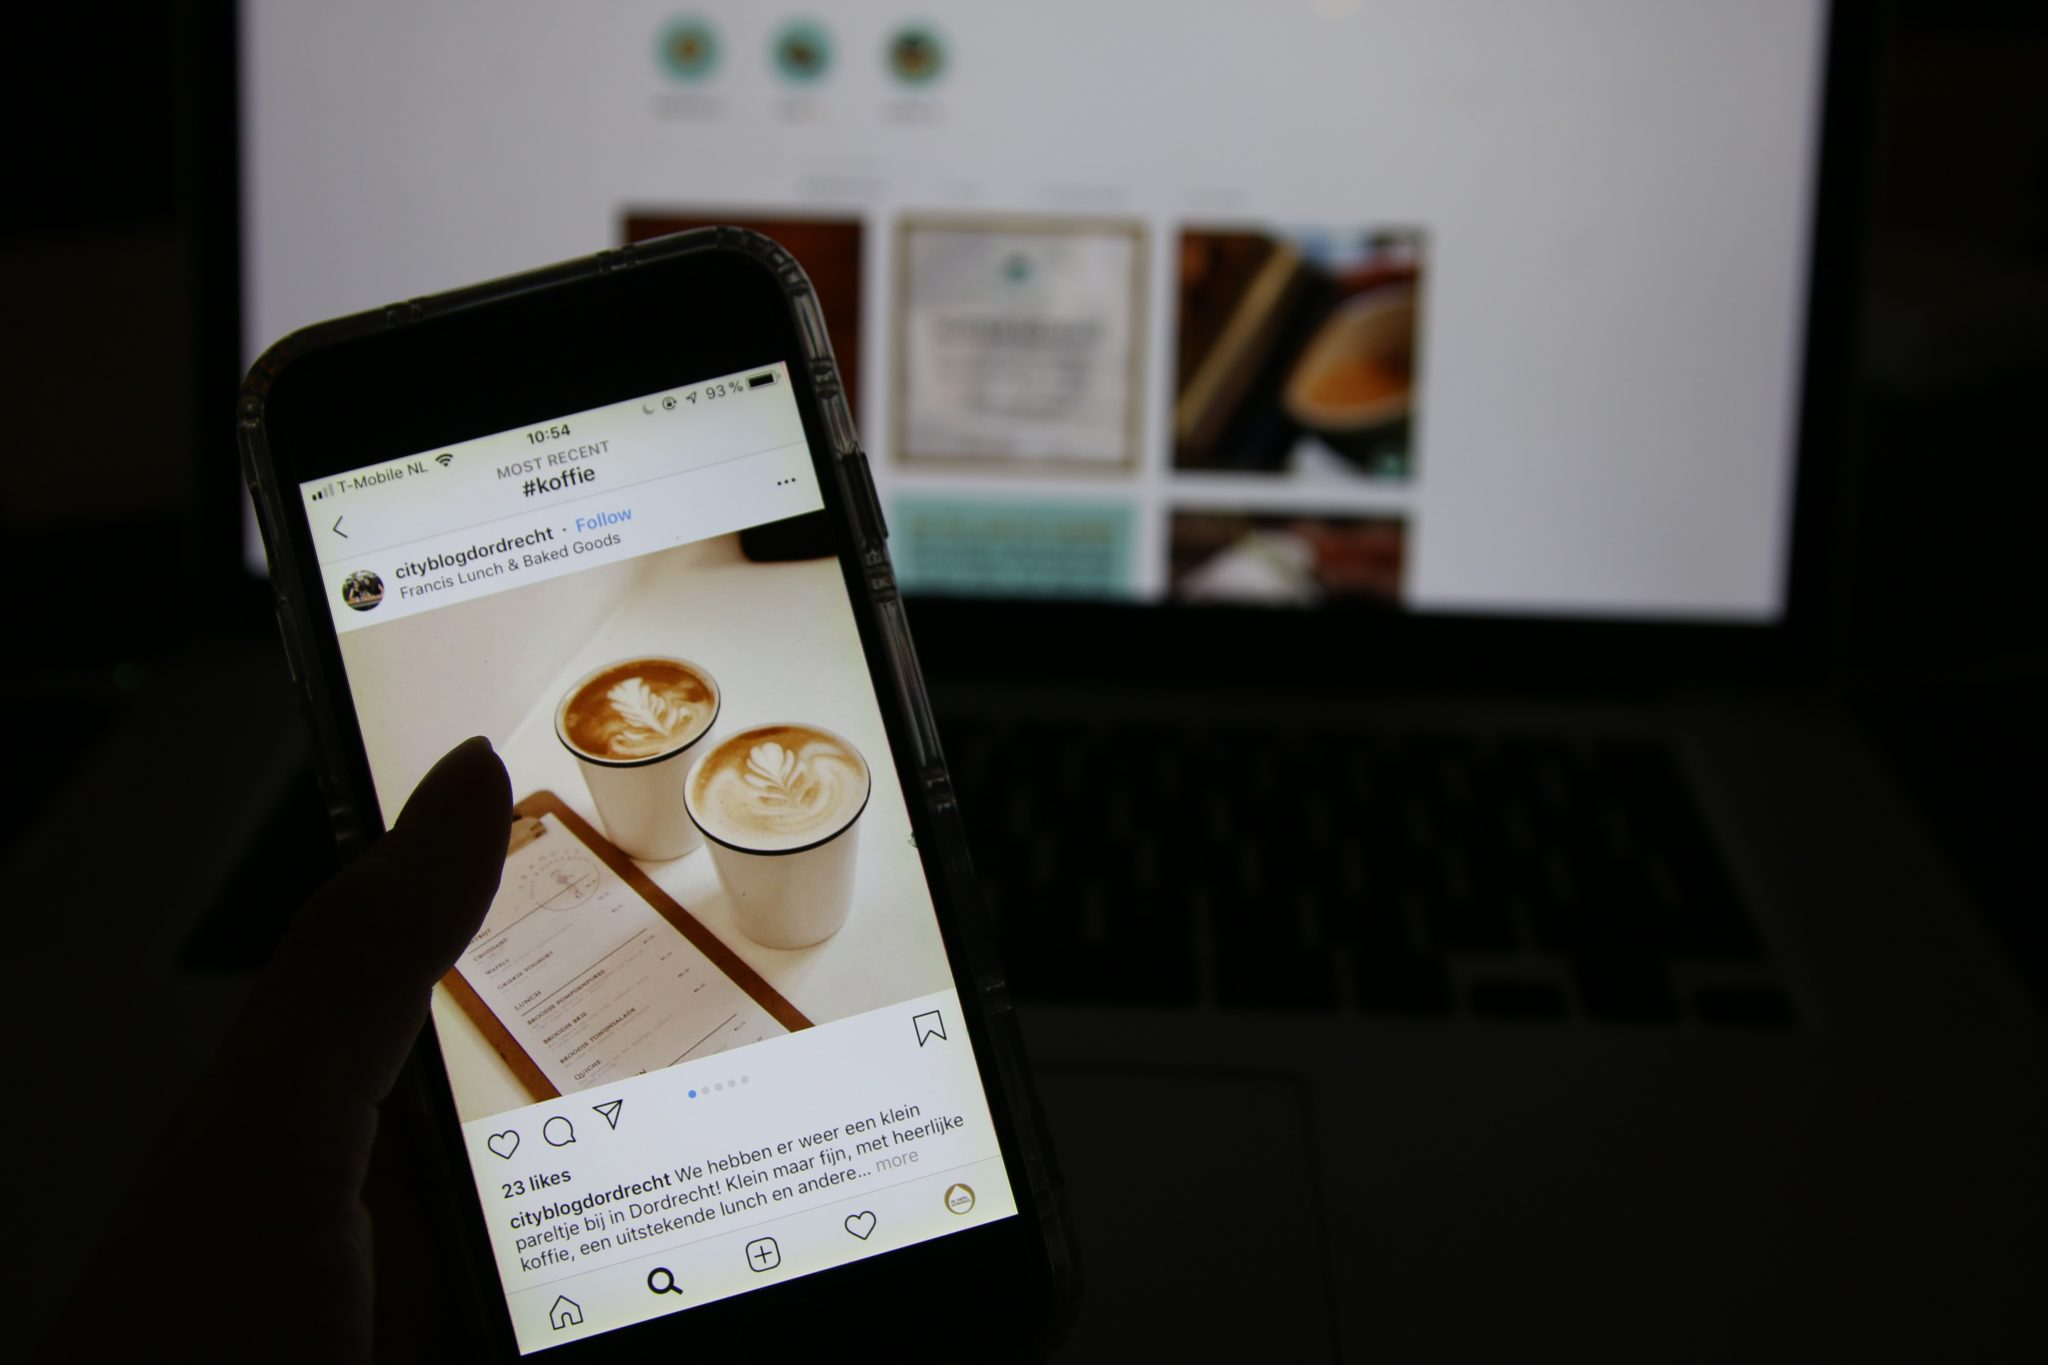 Hospitality-Marketing-Instagram-Horeca-Restaurant-Café-Hotel-Tremento-Hashtag